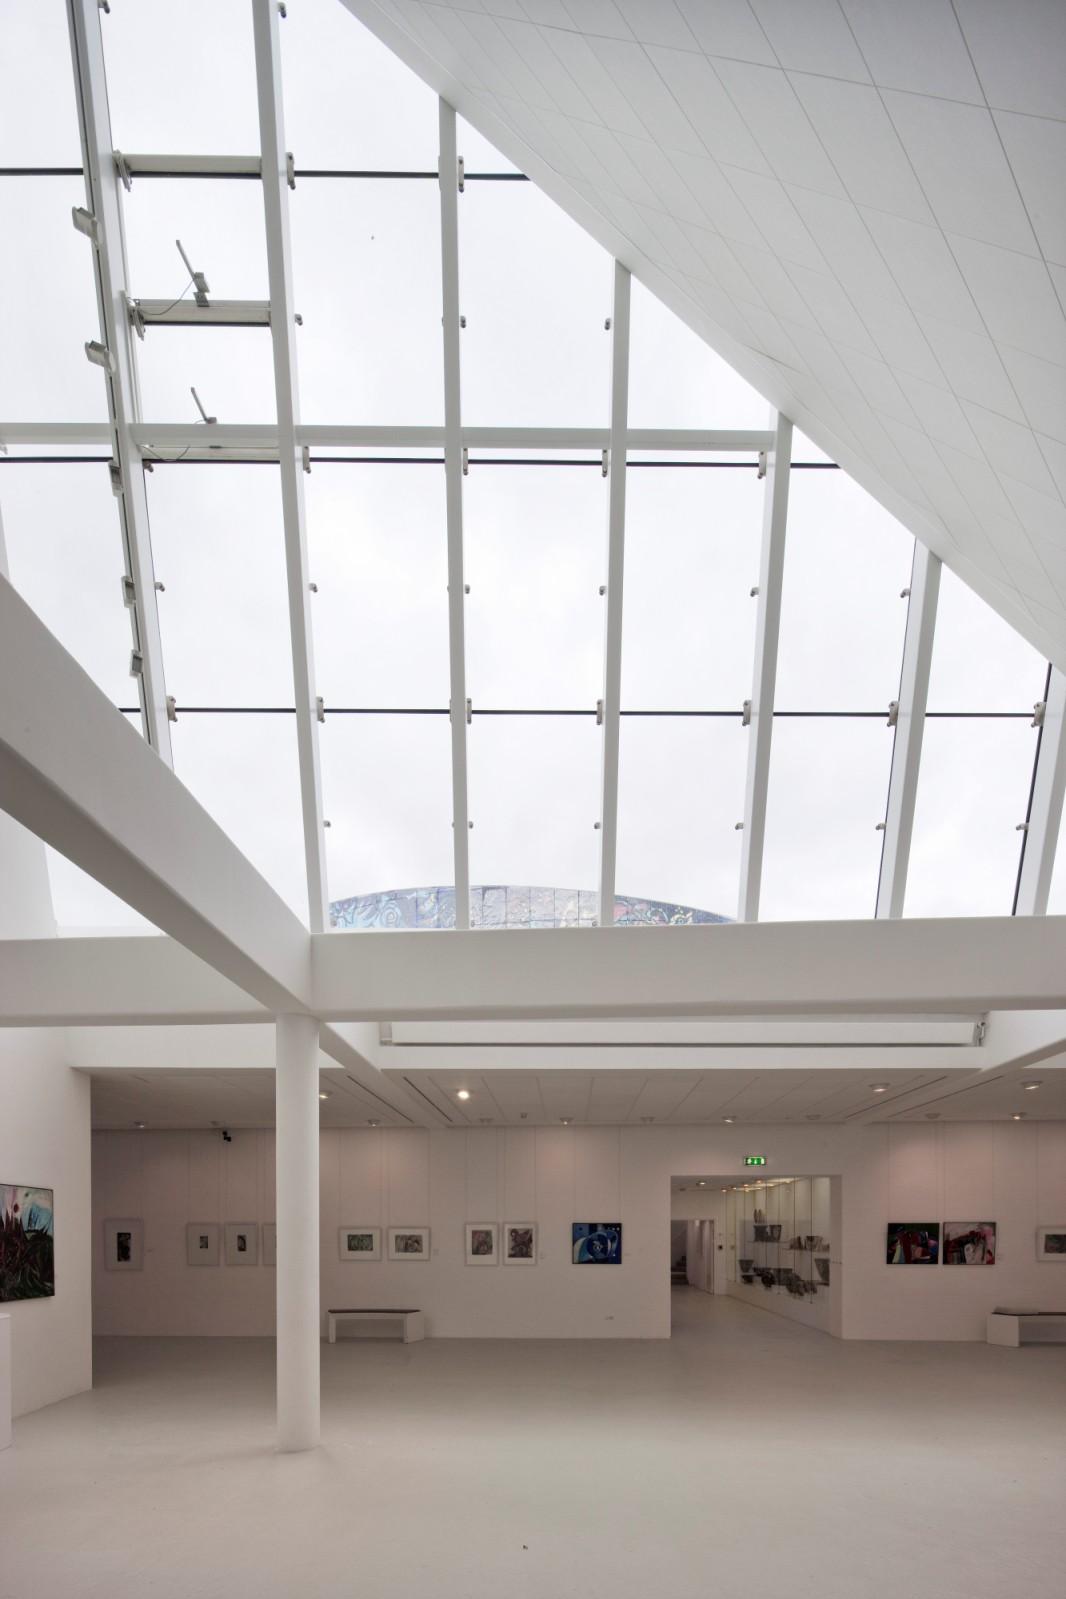 Carl-Henning Pedersen & Else Alfelt Museum